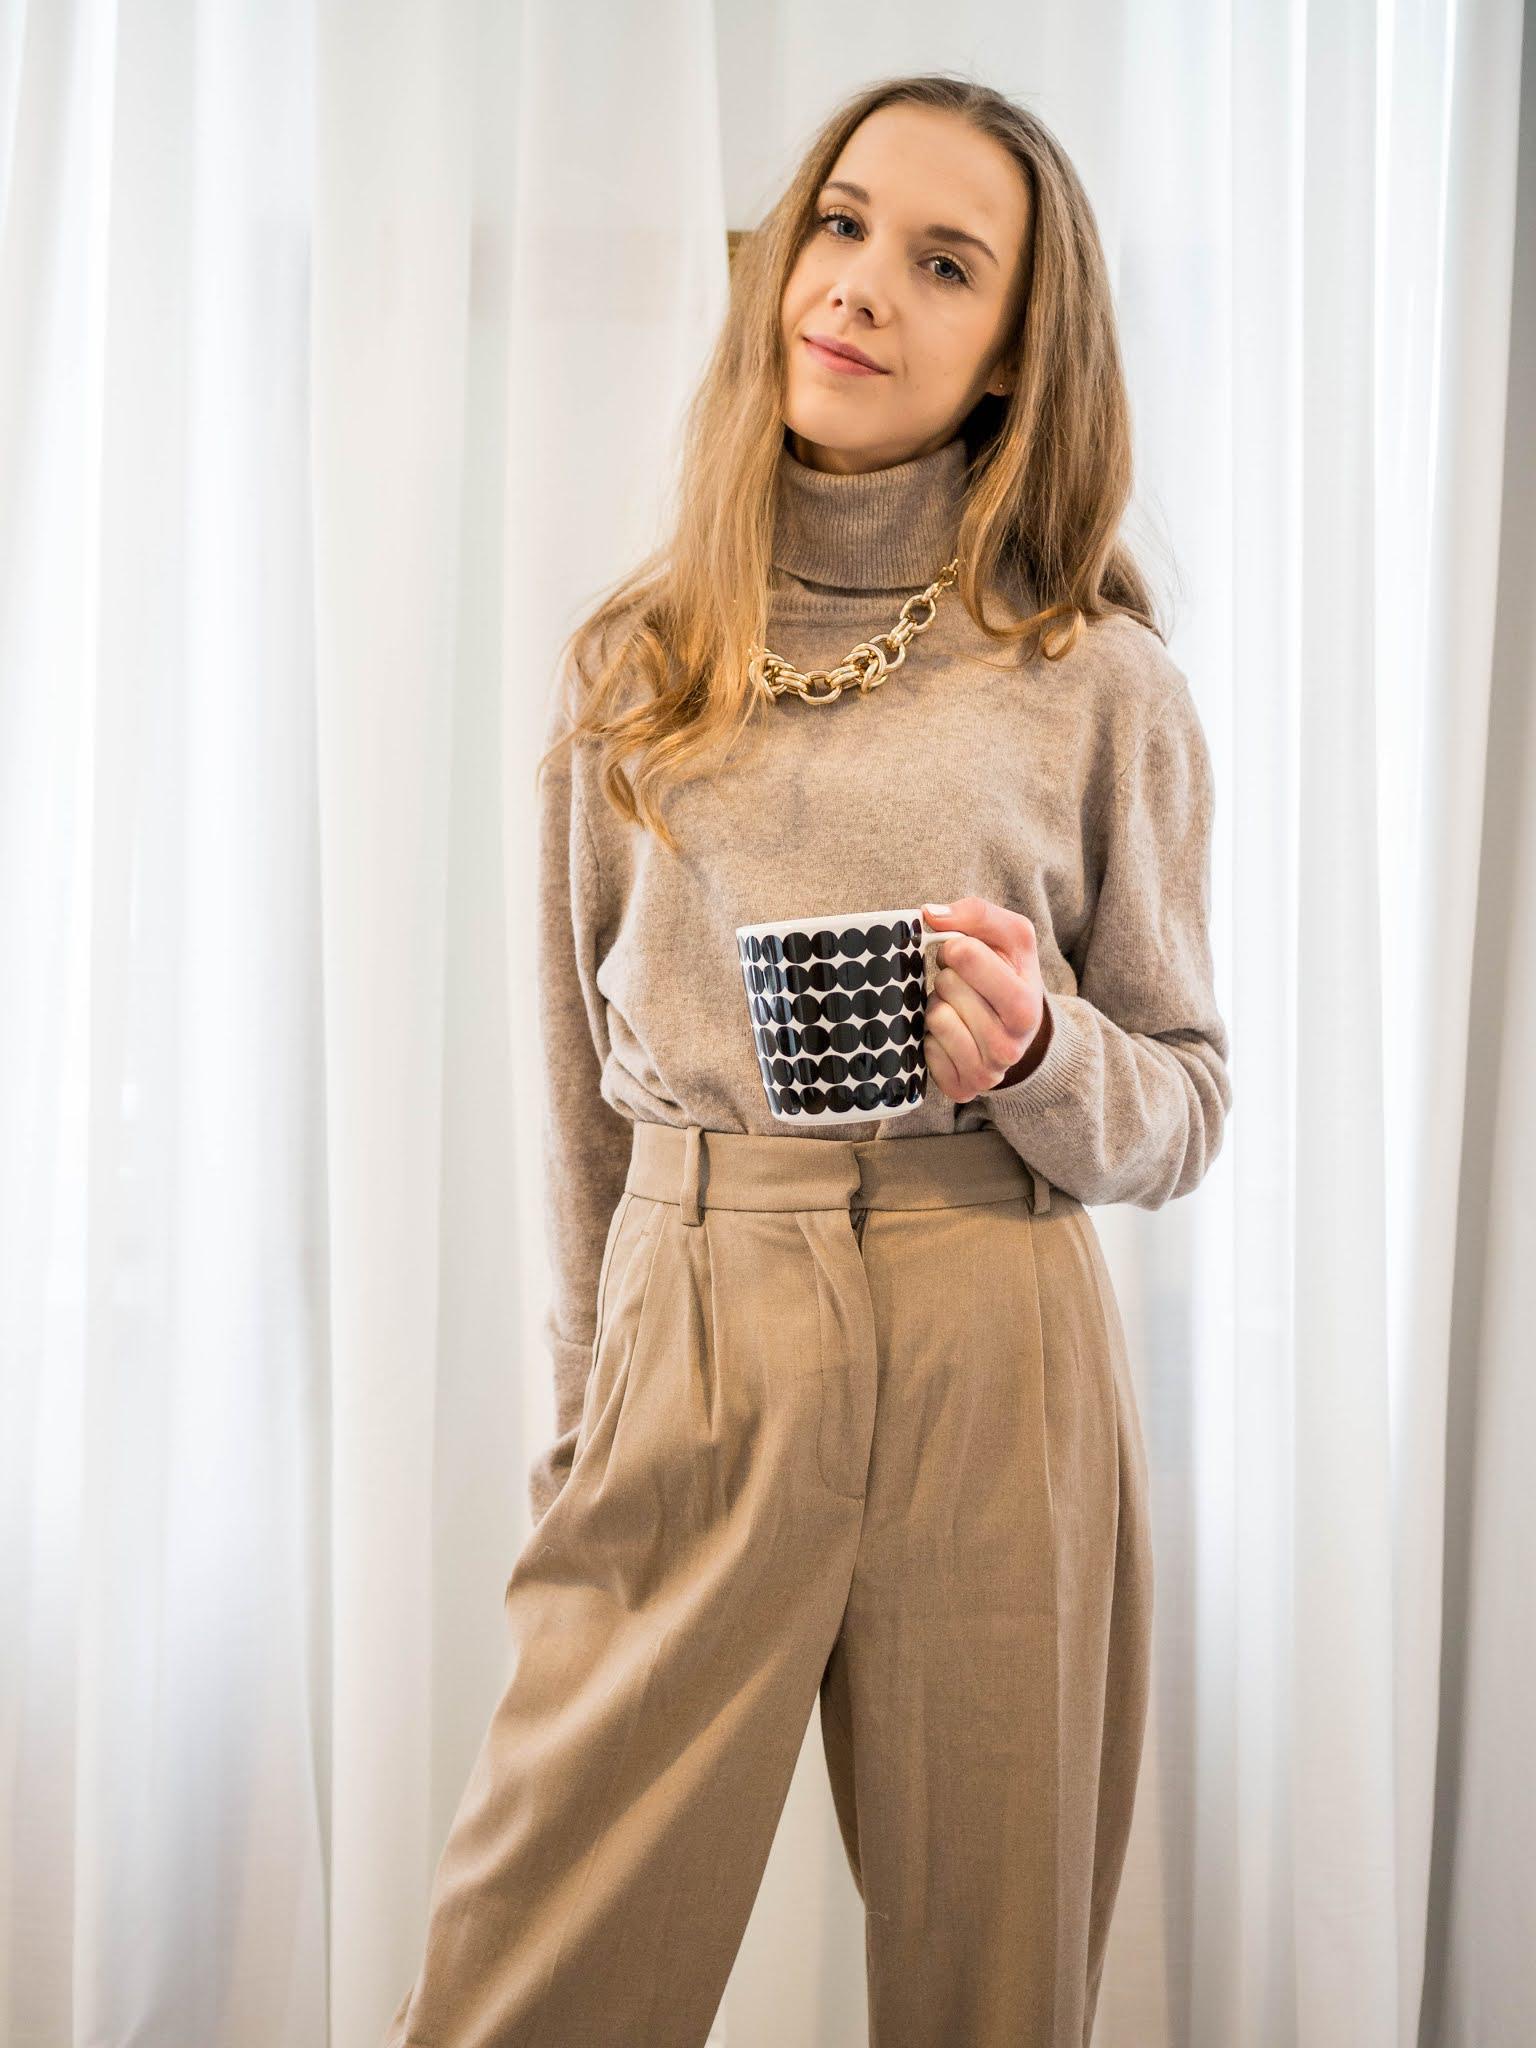 Kuinka pukeutua yhteen väriin // How to dress in one colour